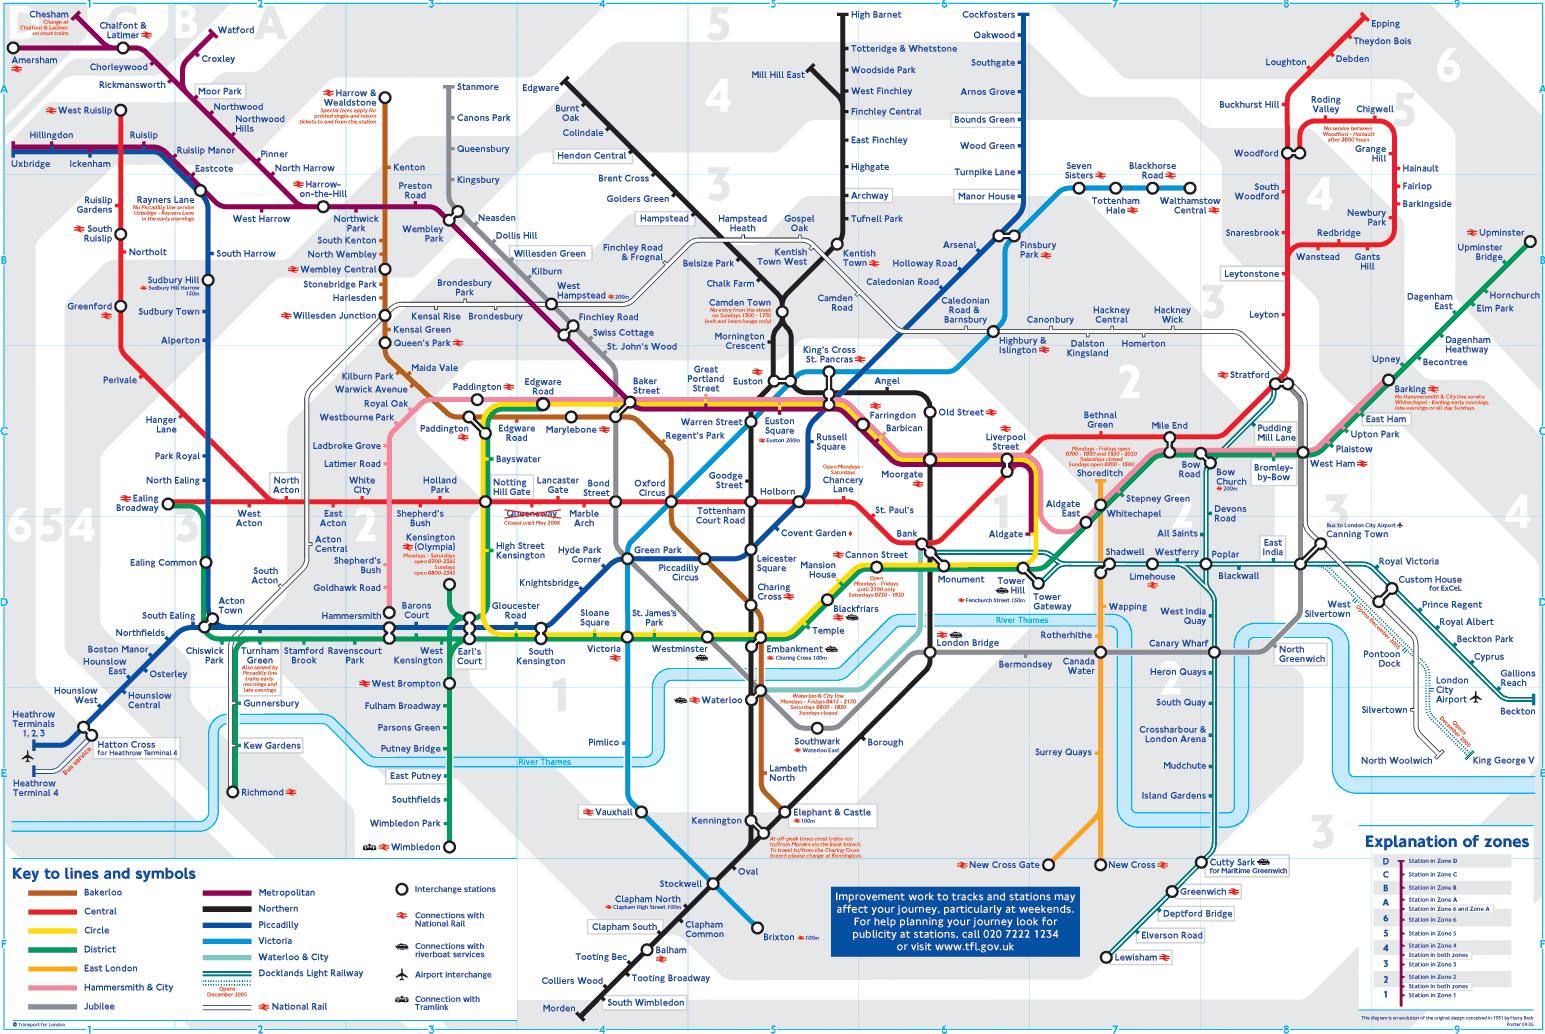 фото метро лондон